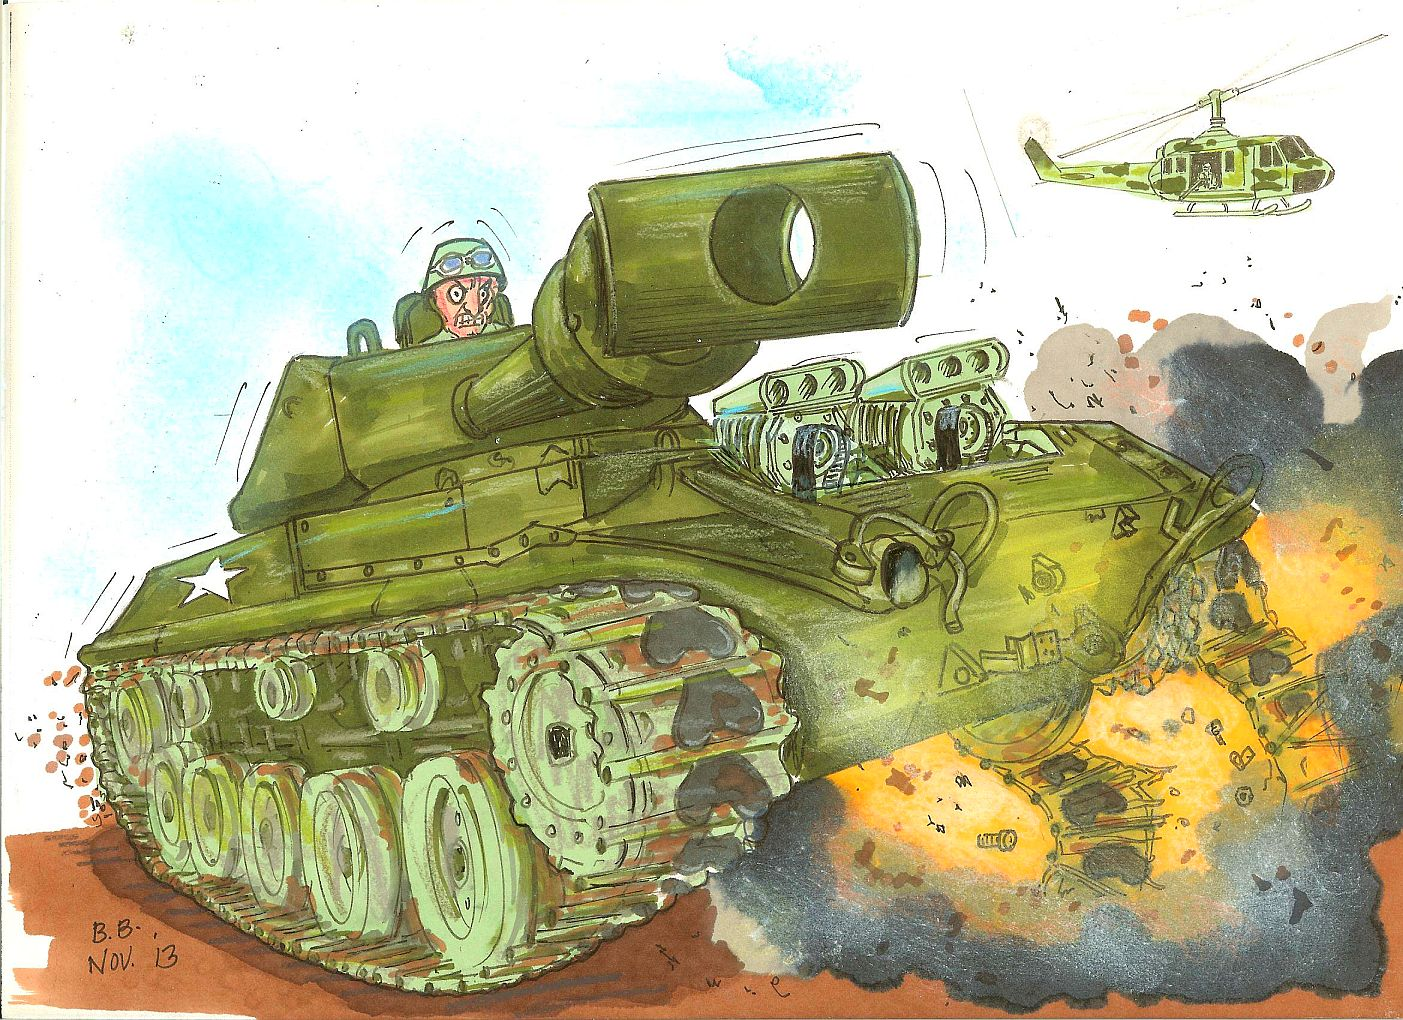 Click image for larger version  Name:hotrod tank.jpg Views:1379 Size:362.9 KB ID:97218